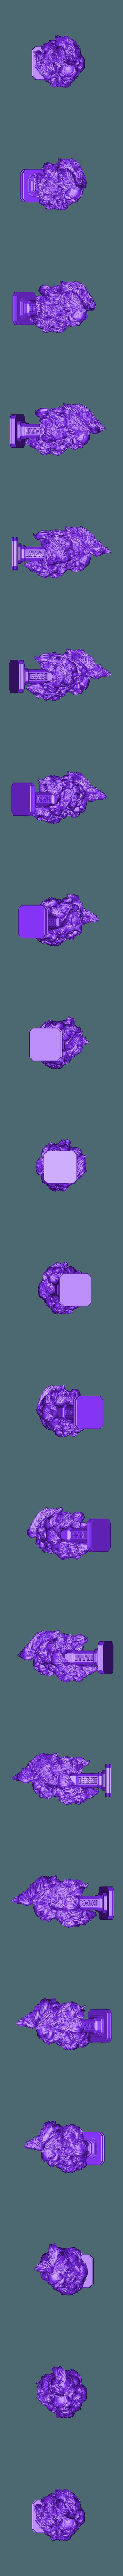 BeardedYell_High_965k.stl Download free STL file The Bearded Yell • 3D printable object, bendansie